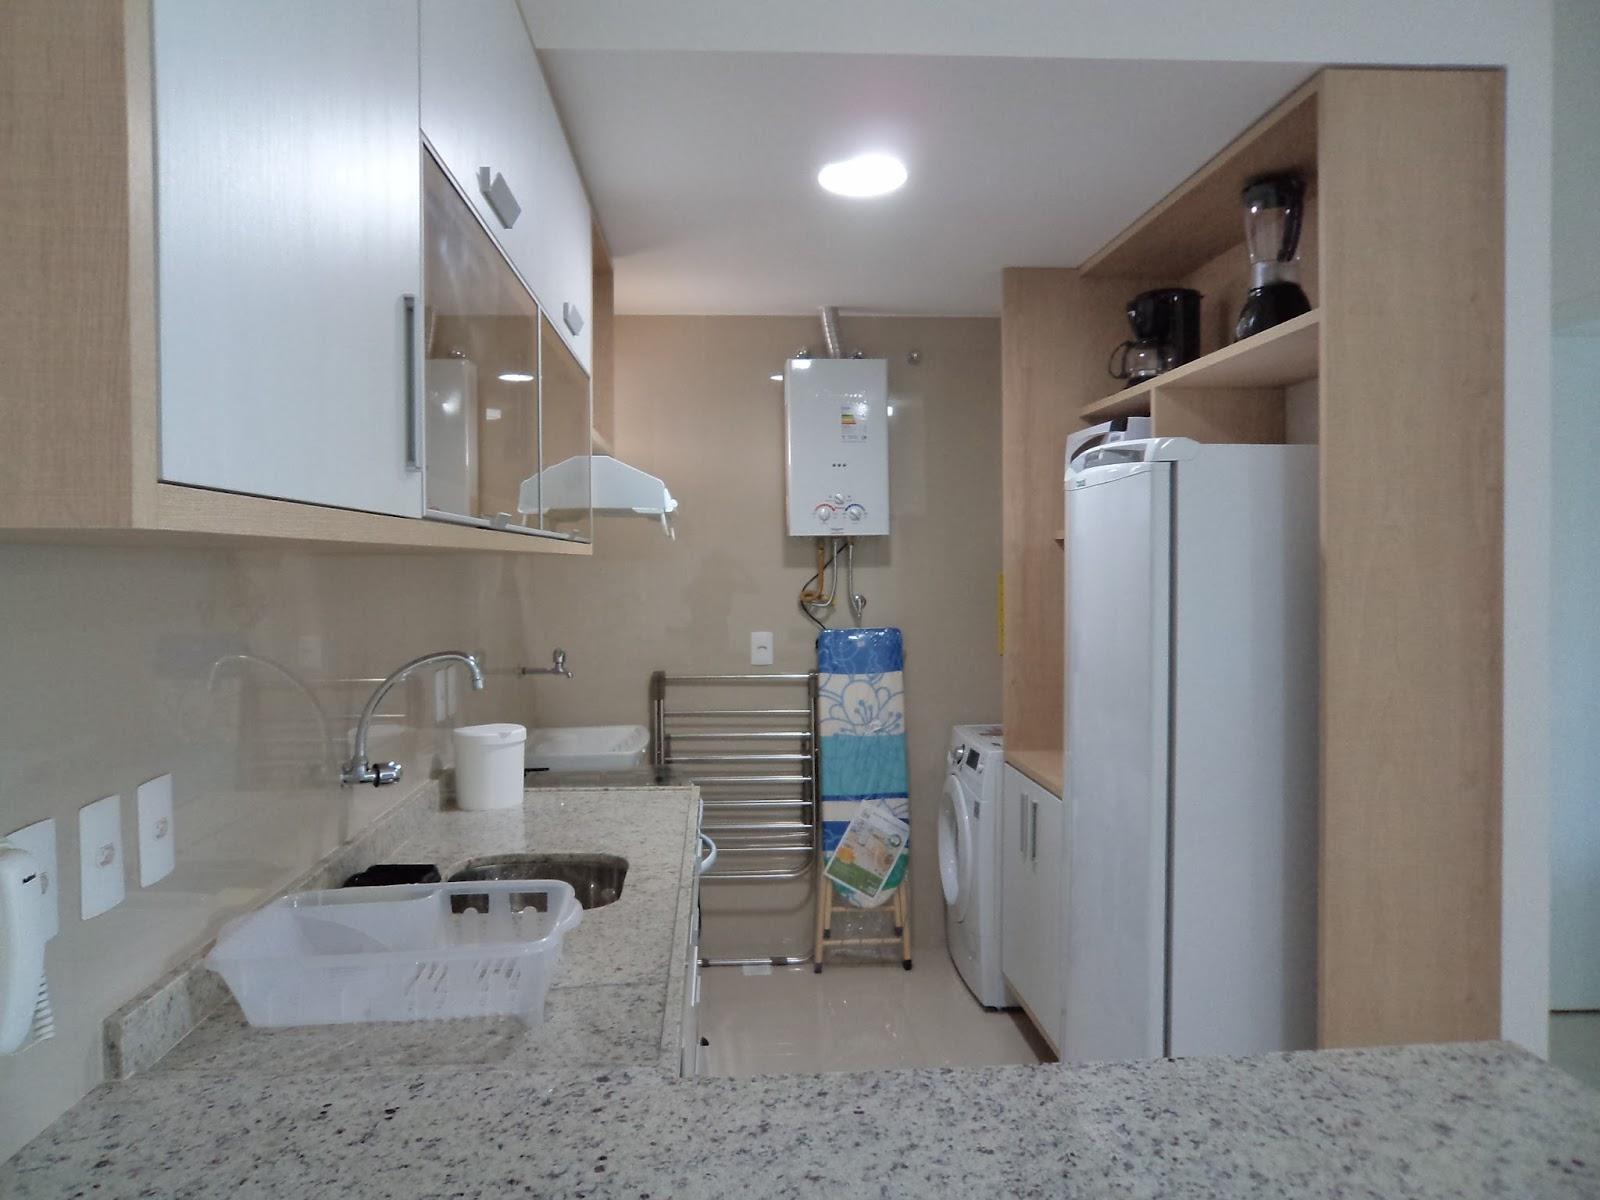 Aluguel por temporada em Fortaleza: APARTAMENTO NA PRAIA DO FUTURO  #476C84 1600x1200 Banheiro Container Fortaleza